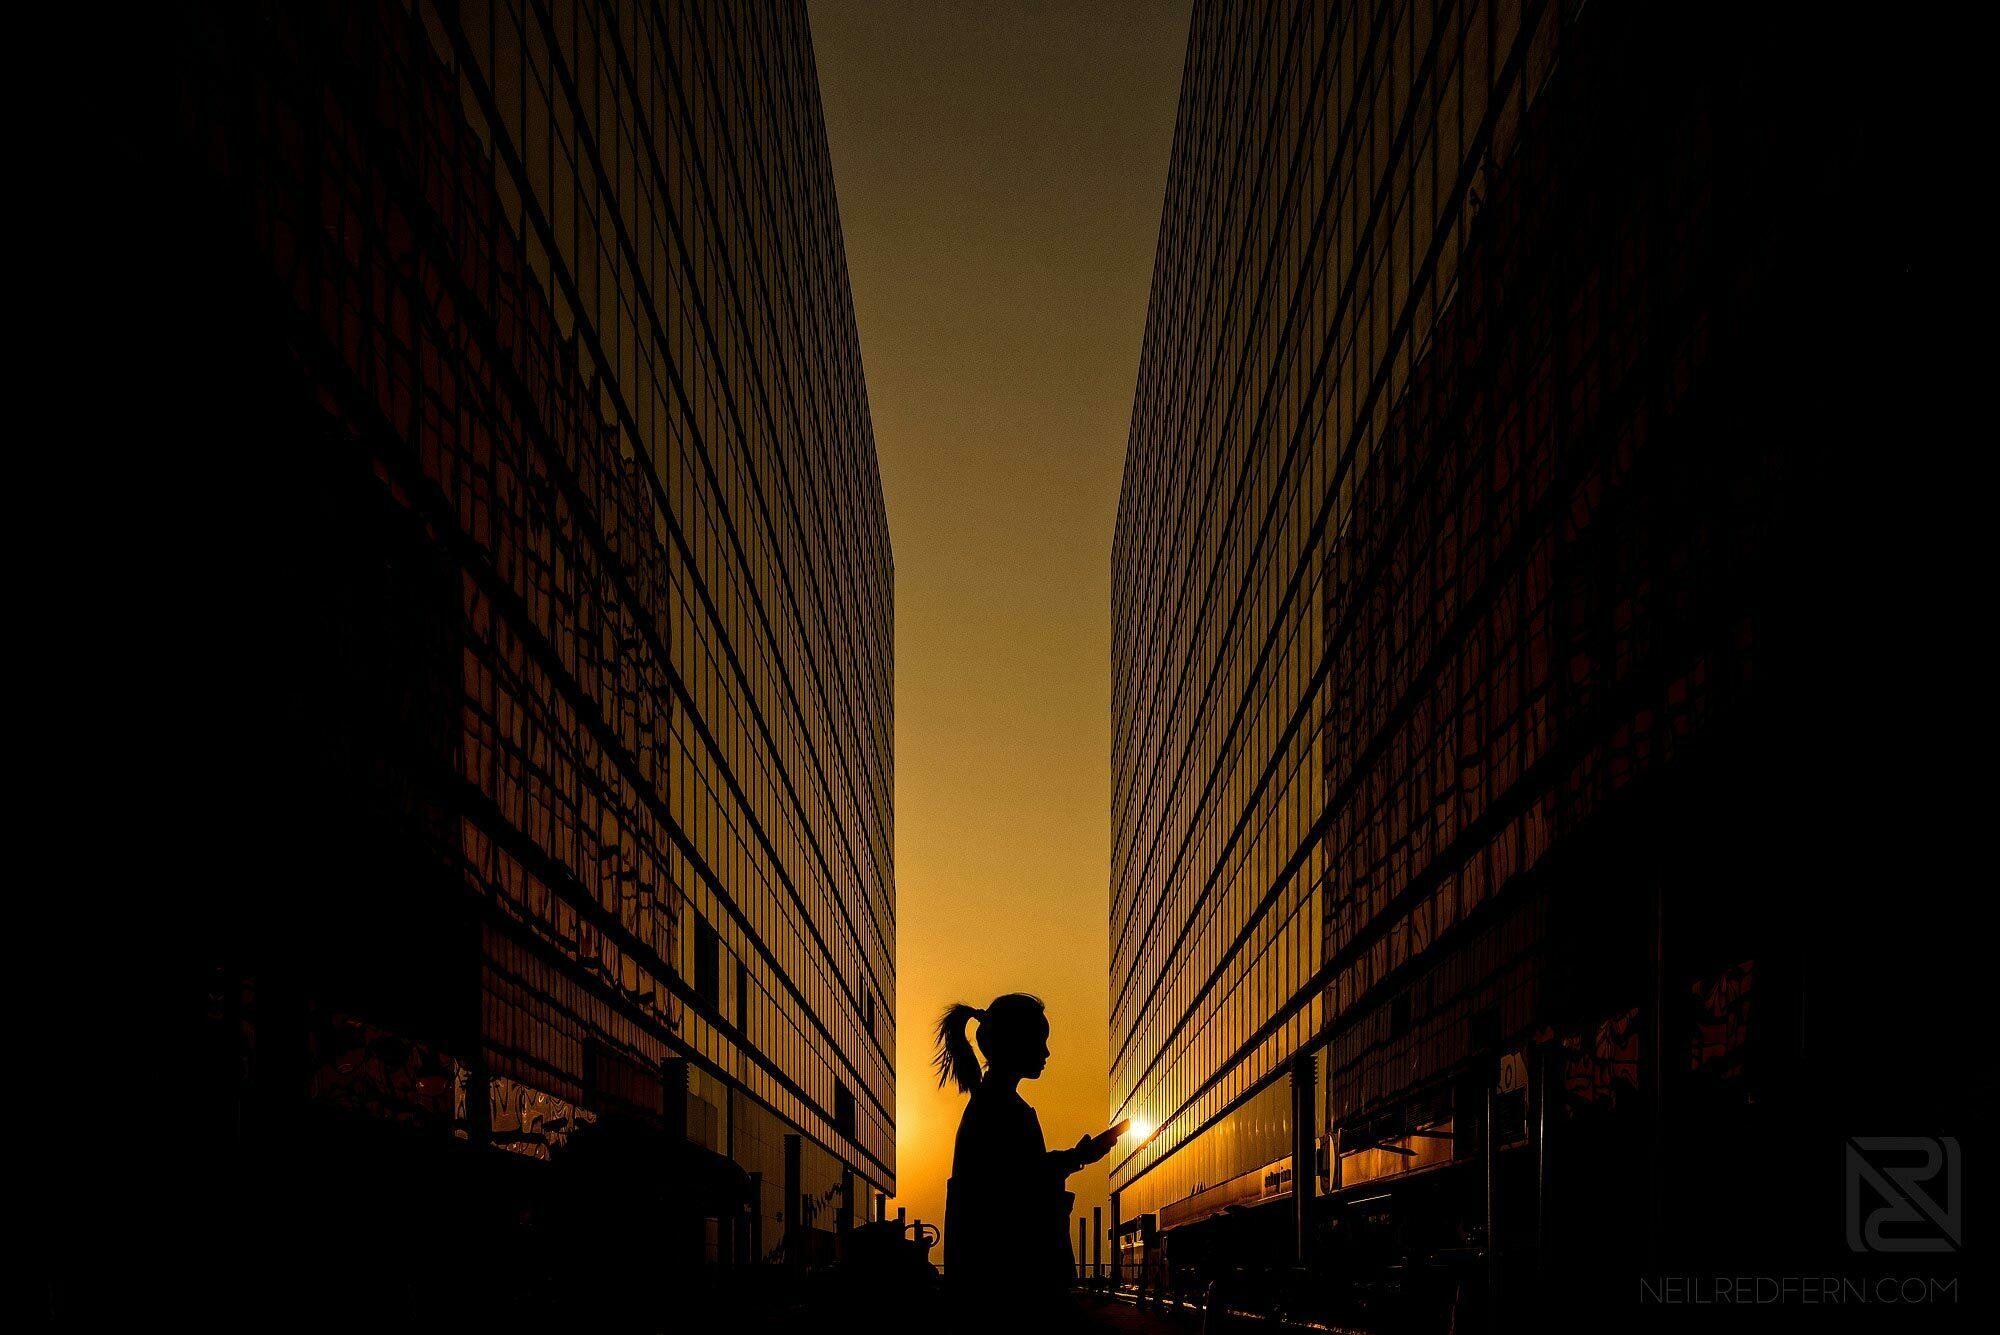 silhouette of woman walking past China Hong Kong City buildings